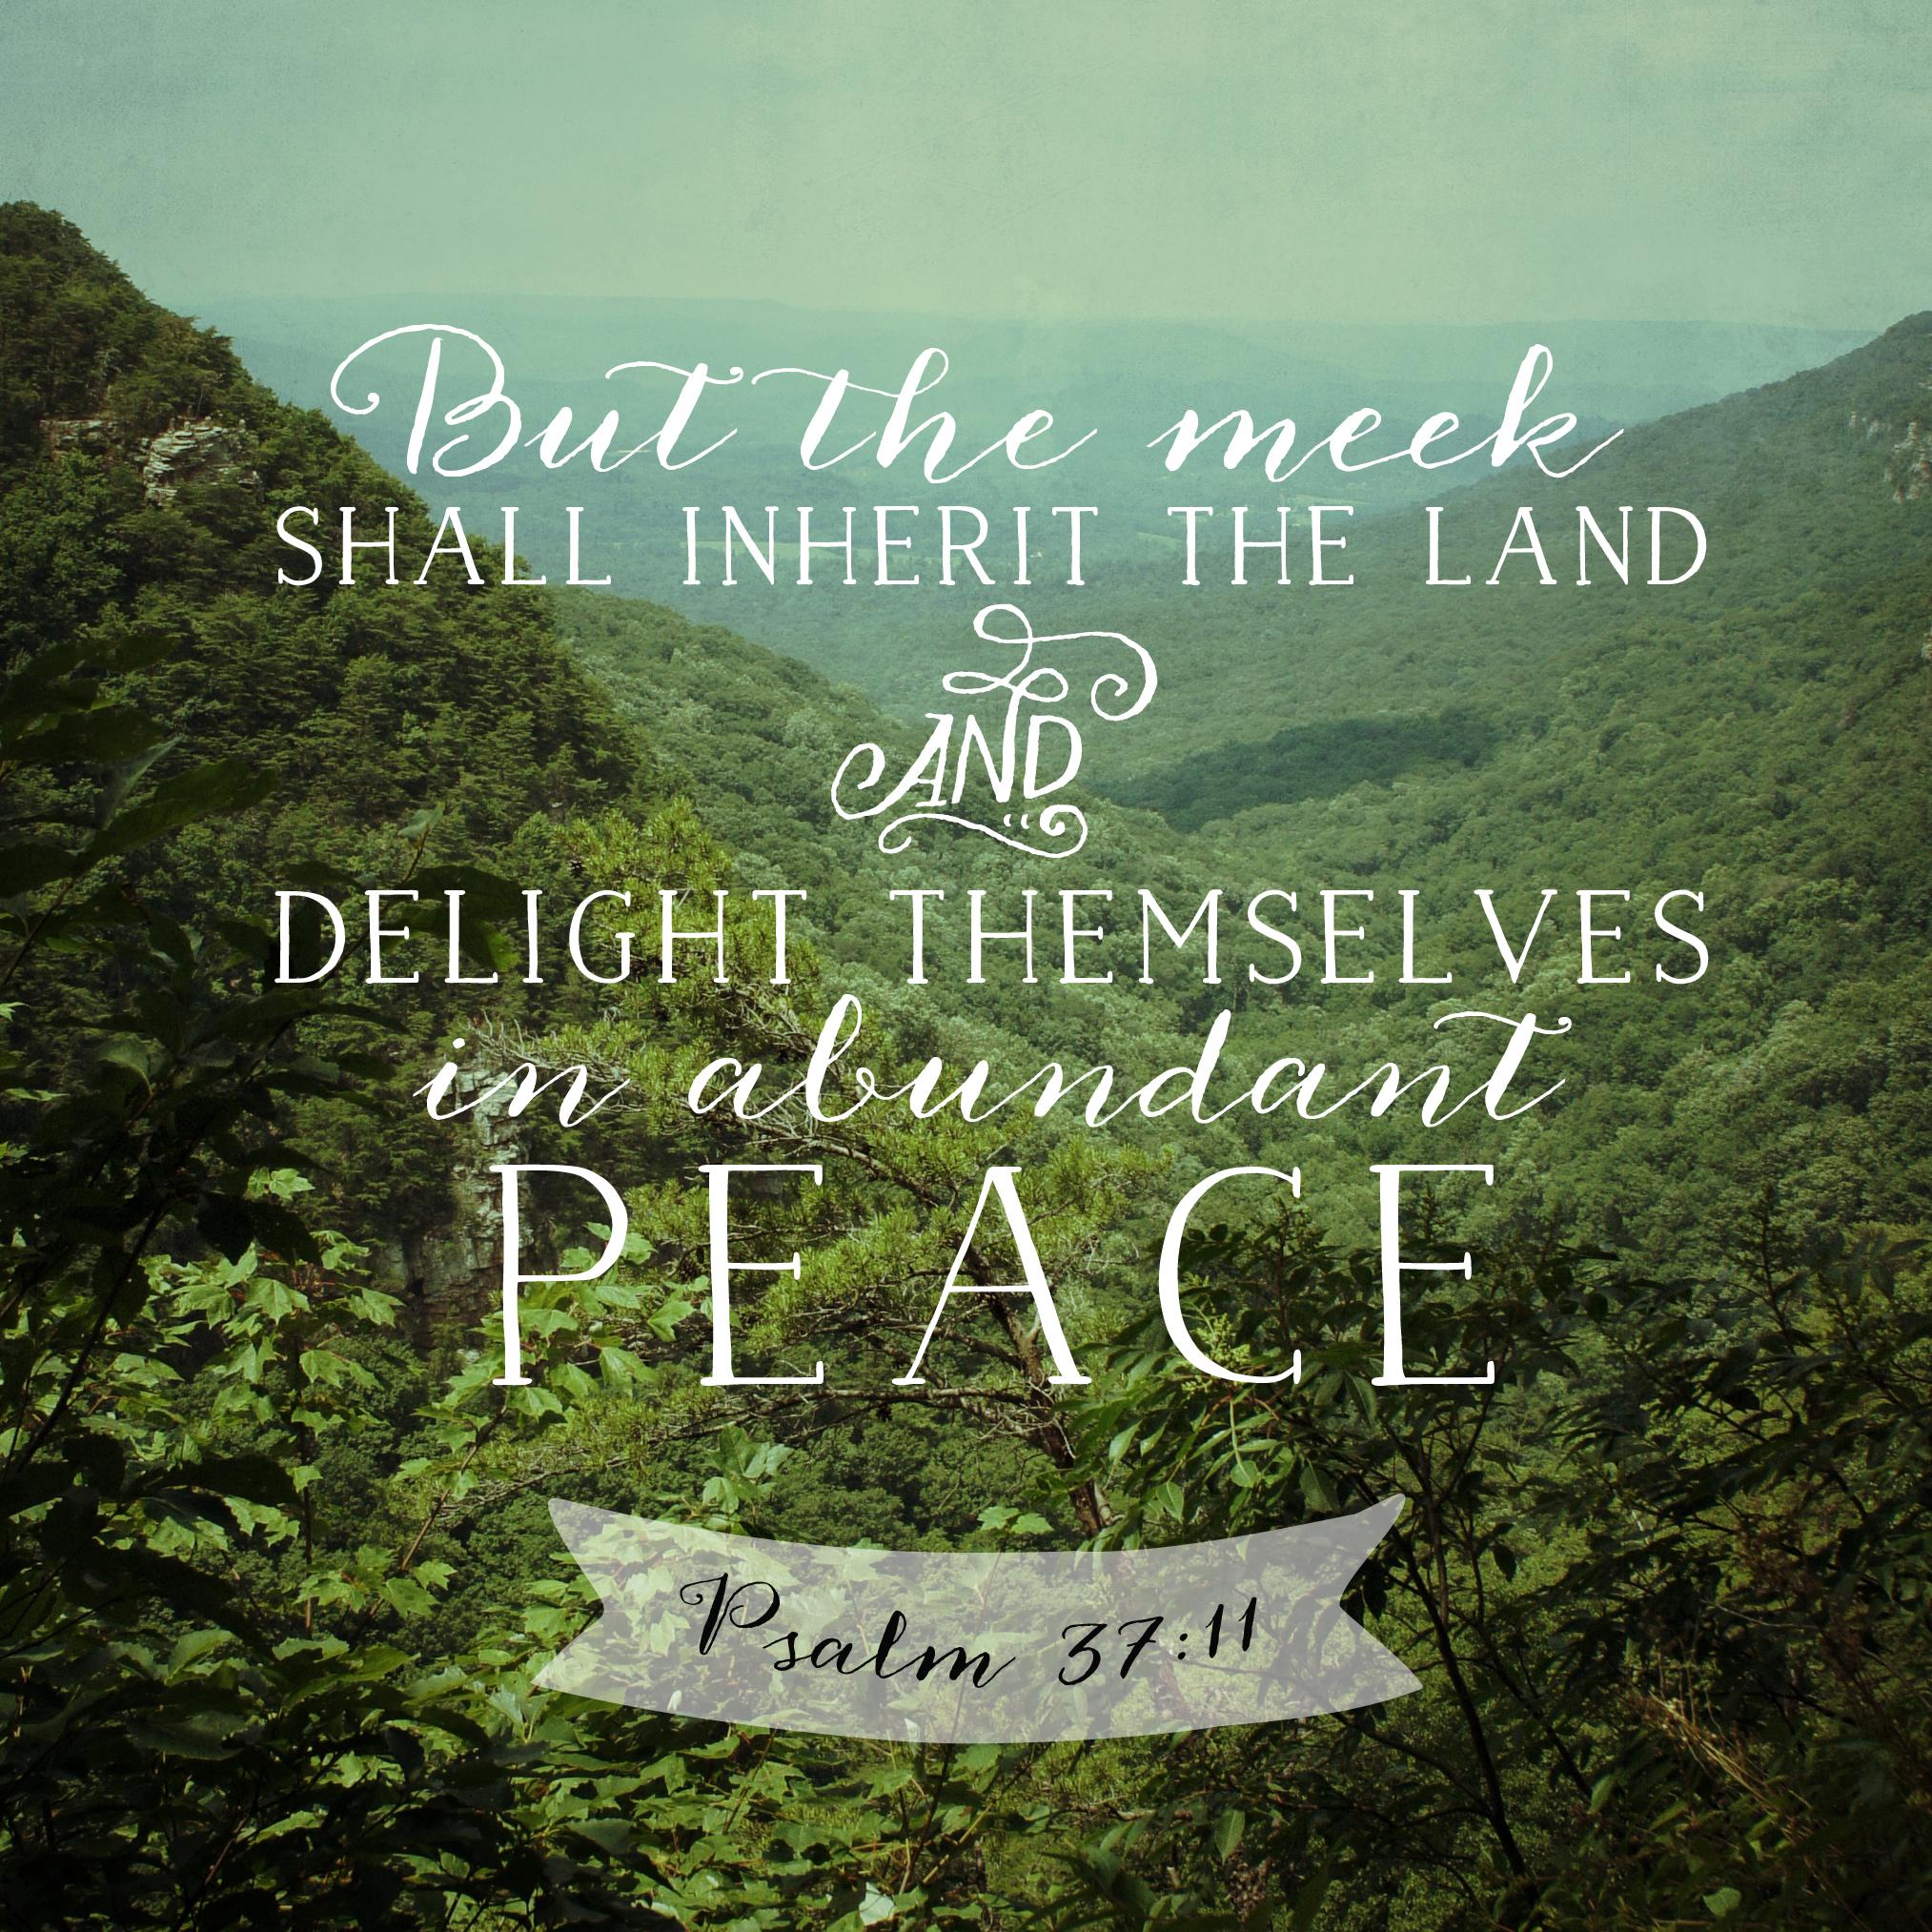 Psalm 37:11